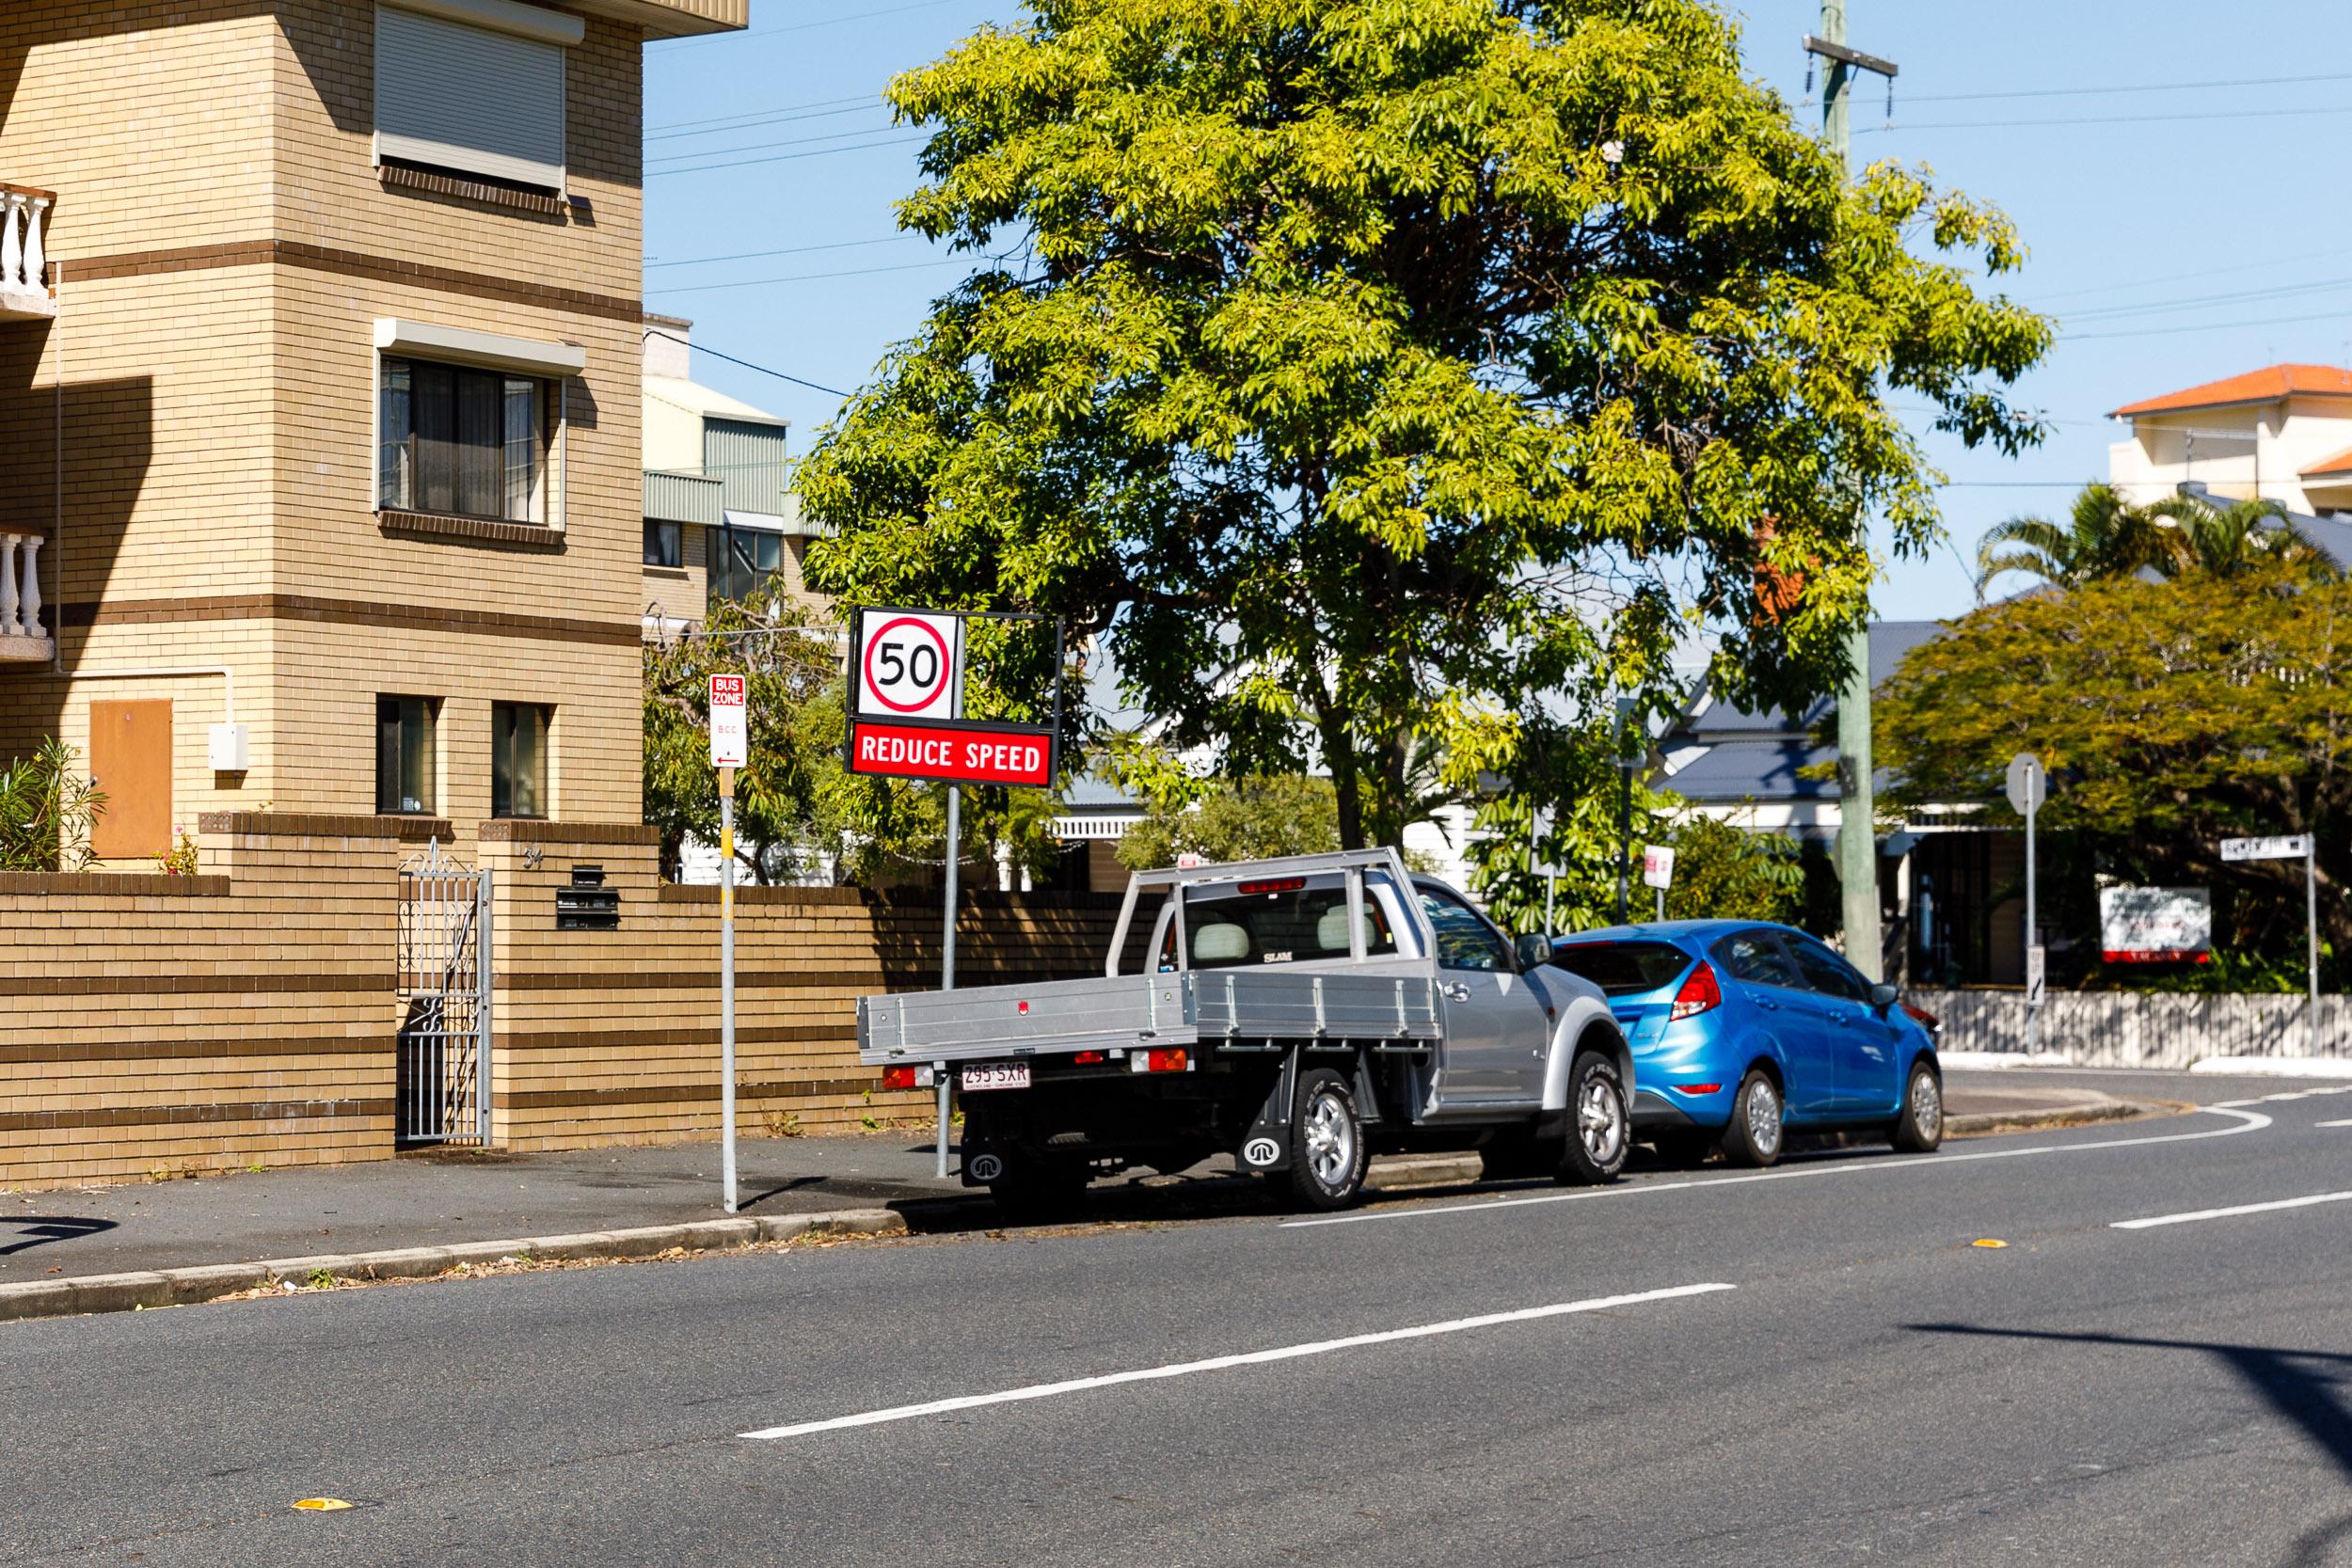 BTA Street Parking - BTA is on the right hand side